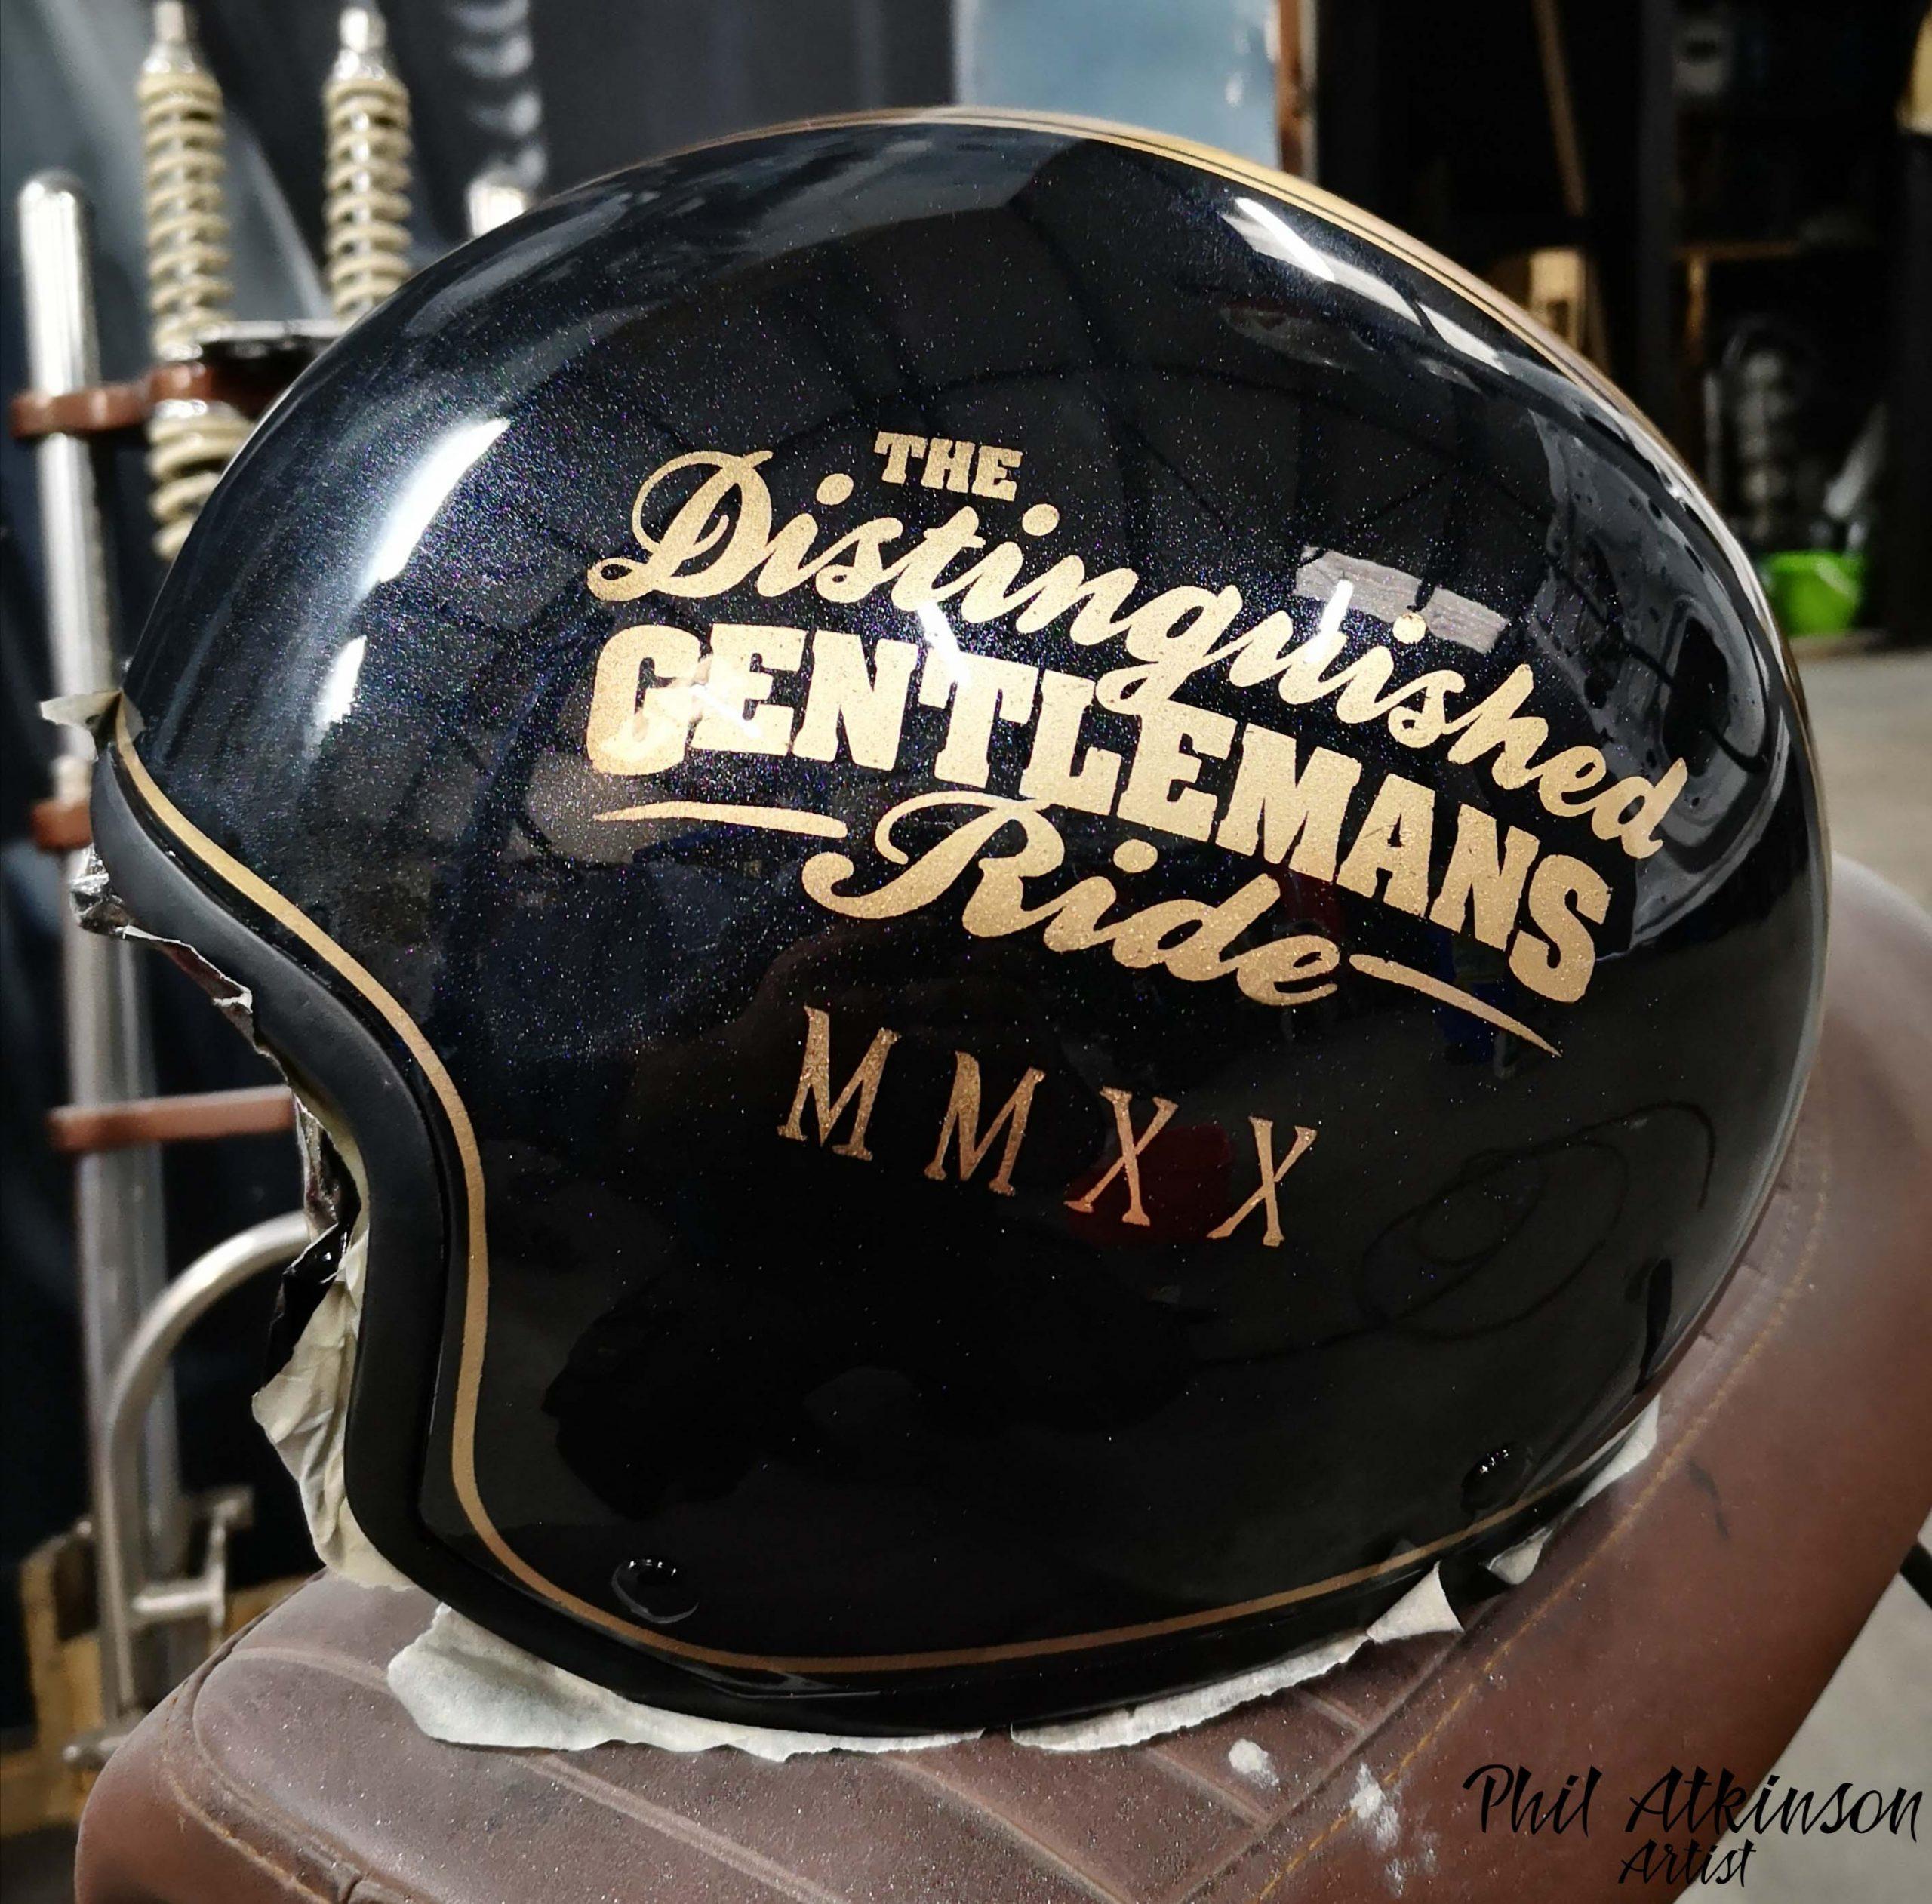 The Distinguished Gentleman Ride Helmet by Phil Atkinson Artist